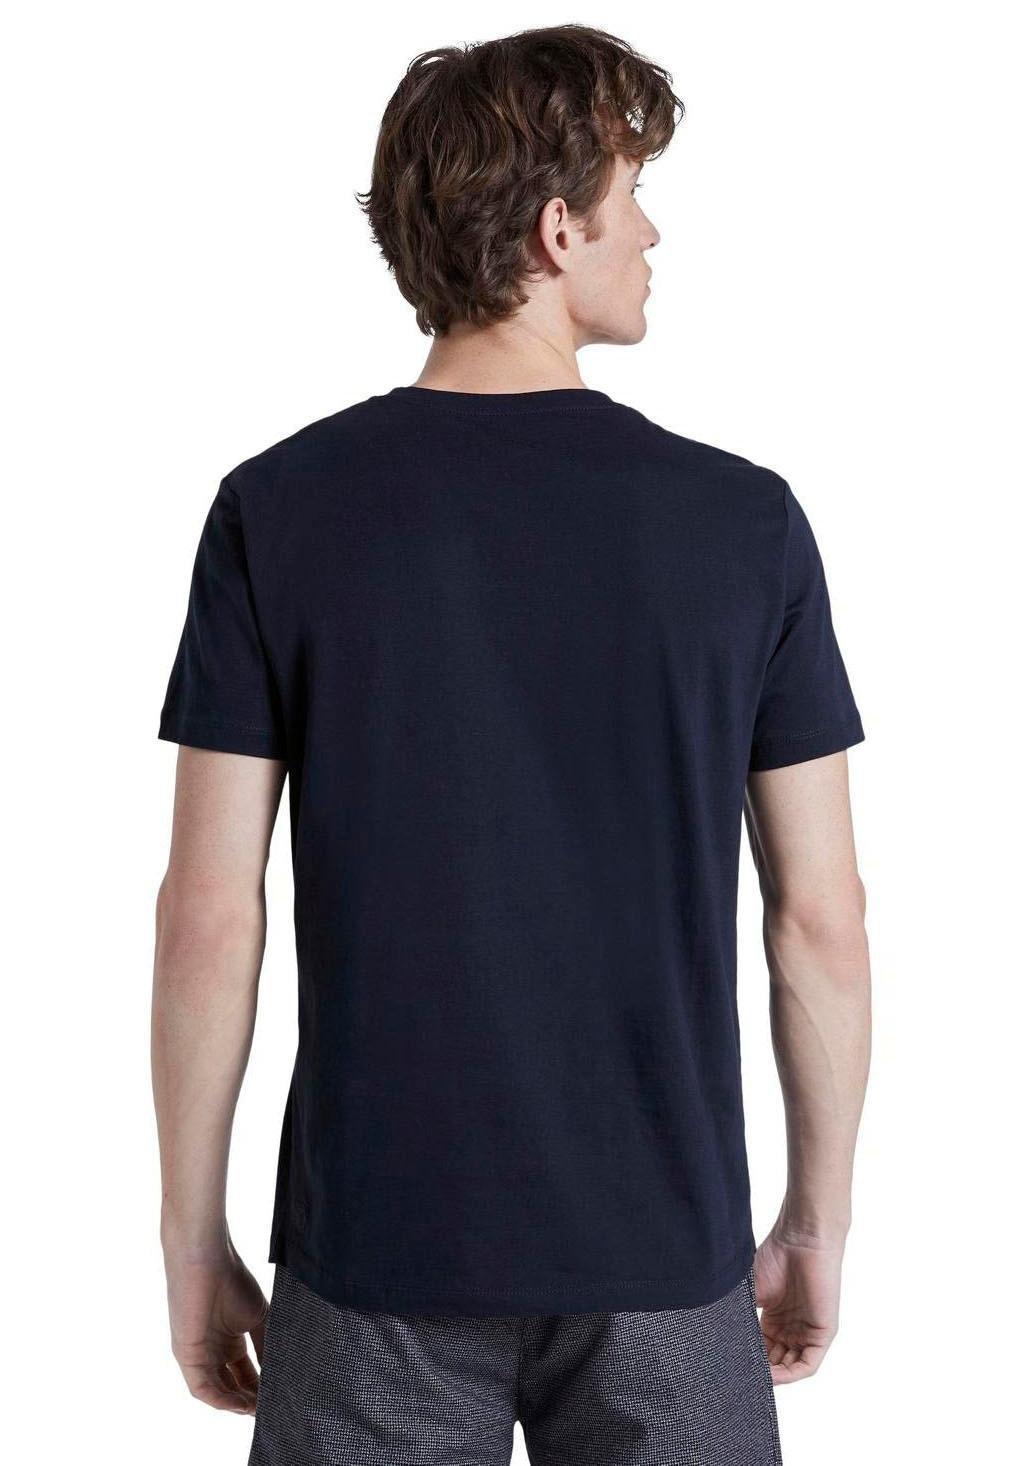 TOM TAILOR Denim shirt met ronde hals - verschillende betaalmethodes